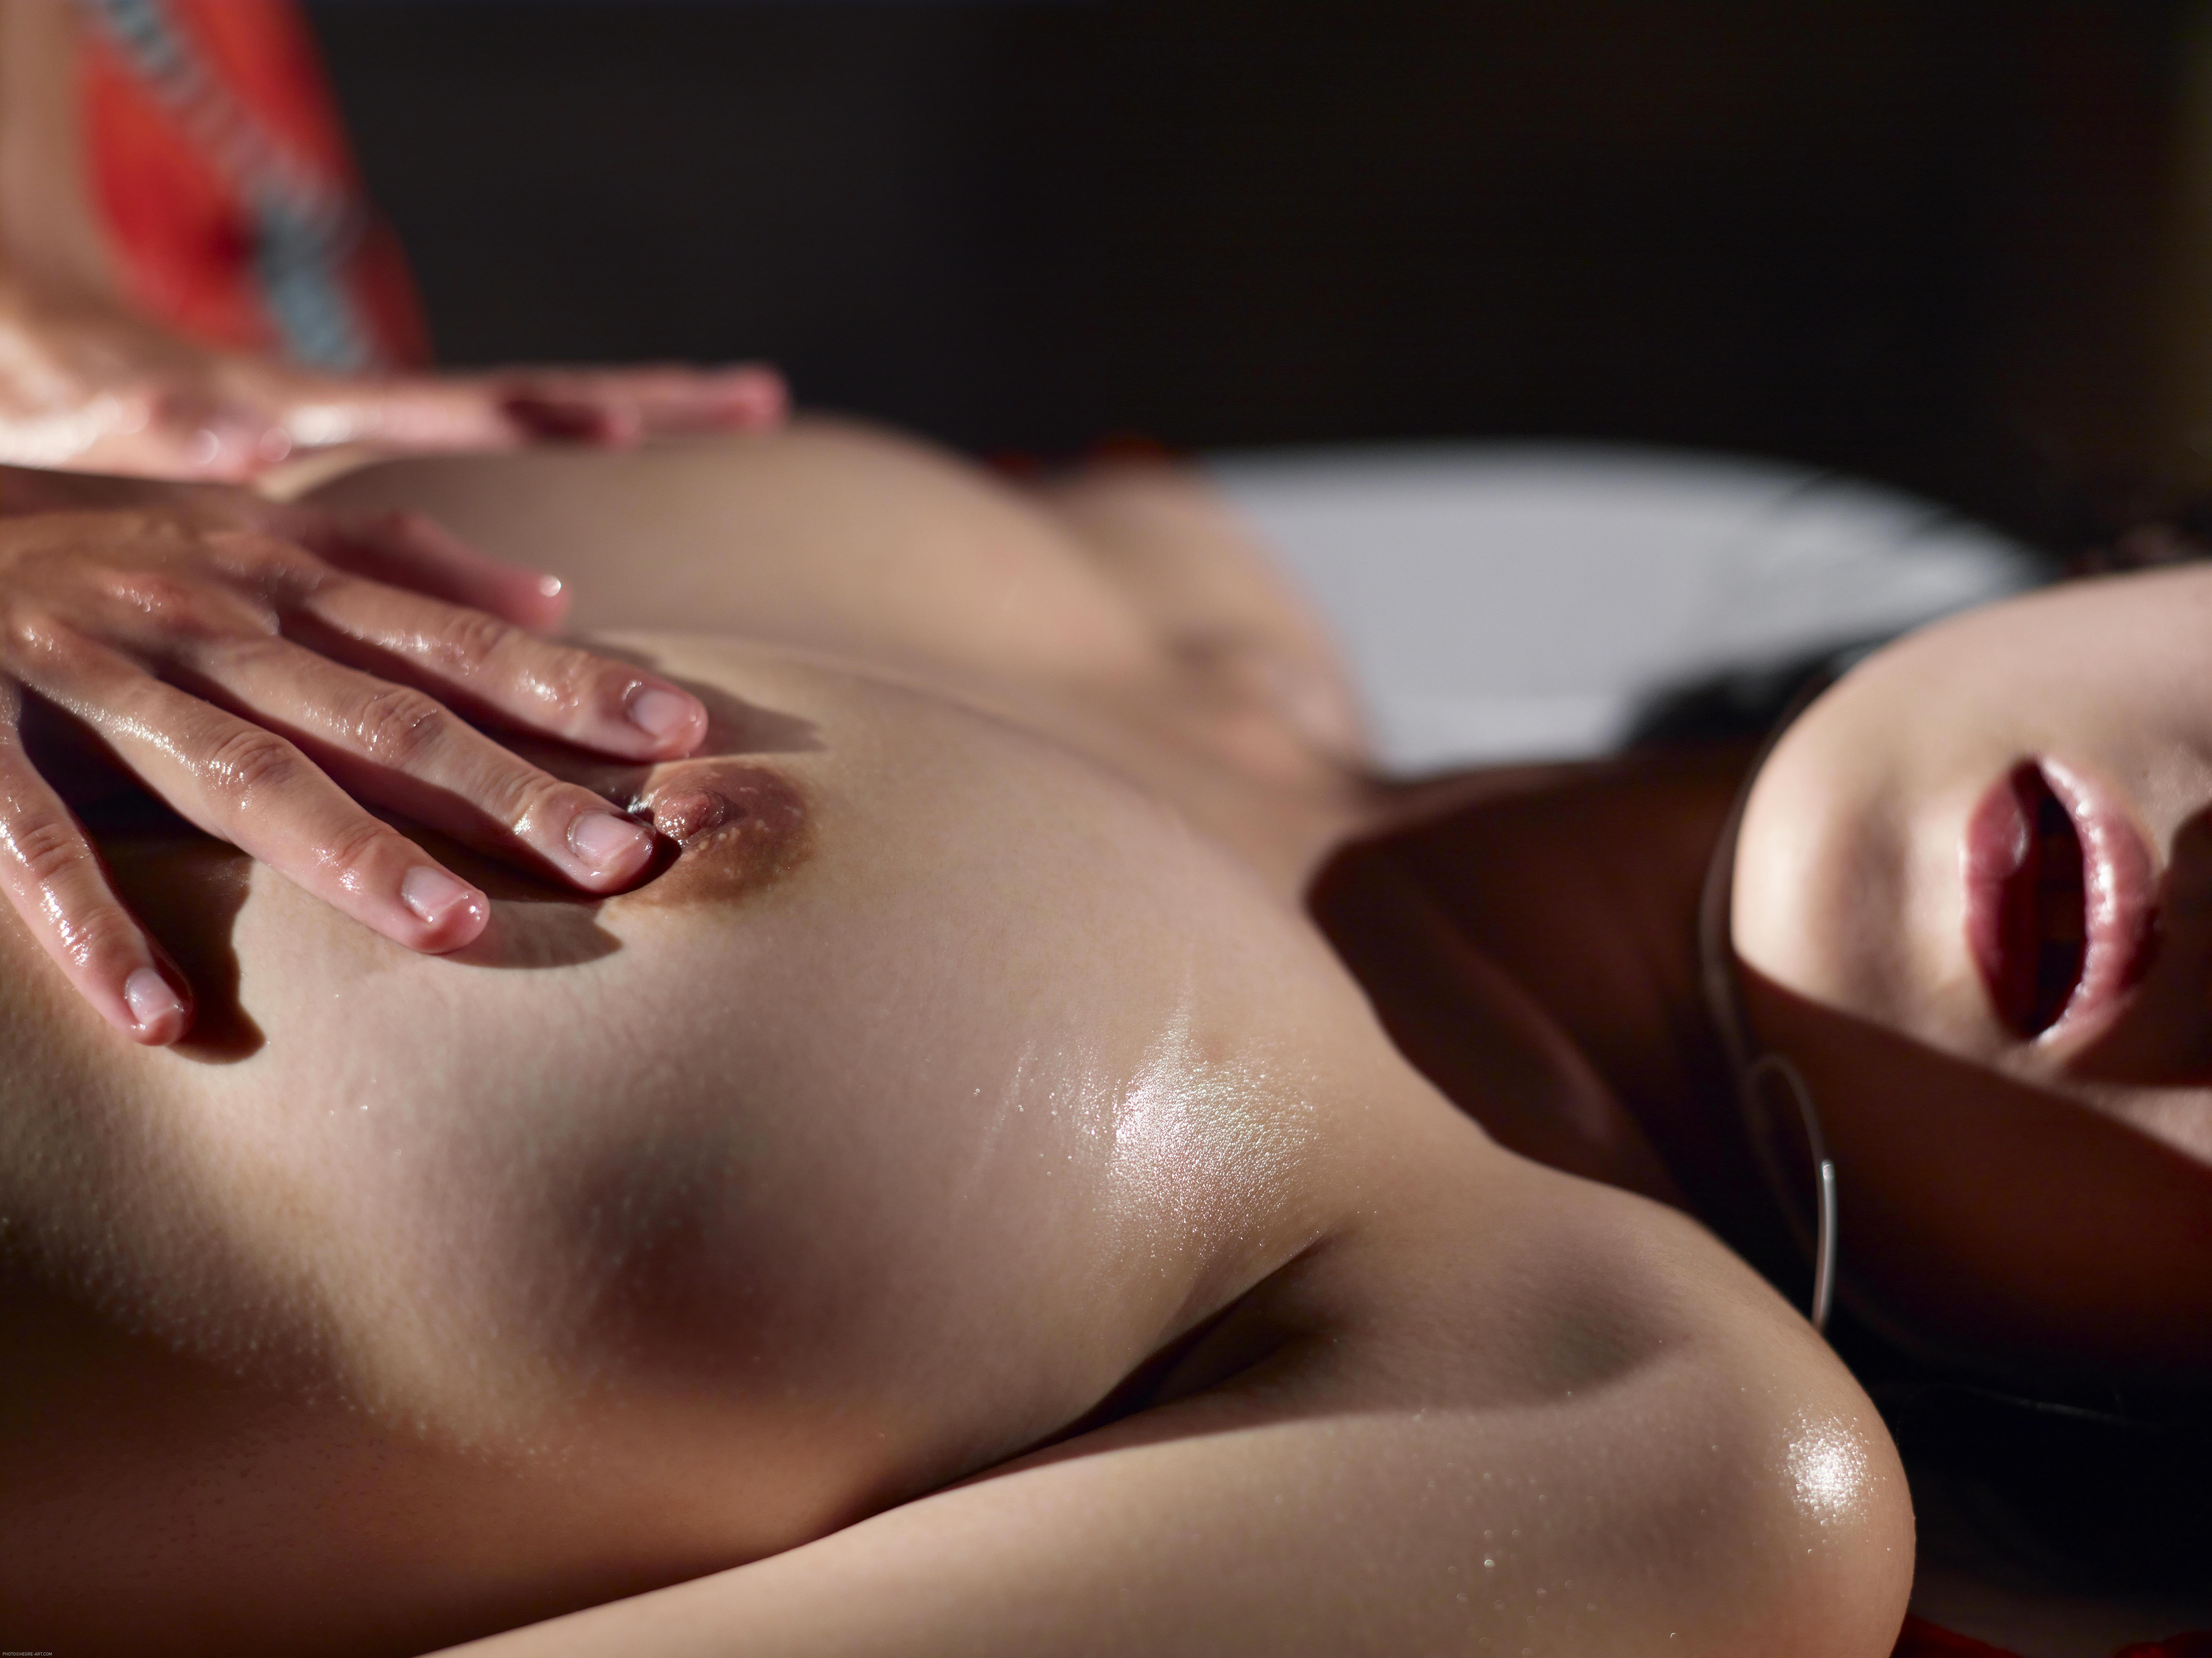 yoni massage gratis voksen chat